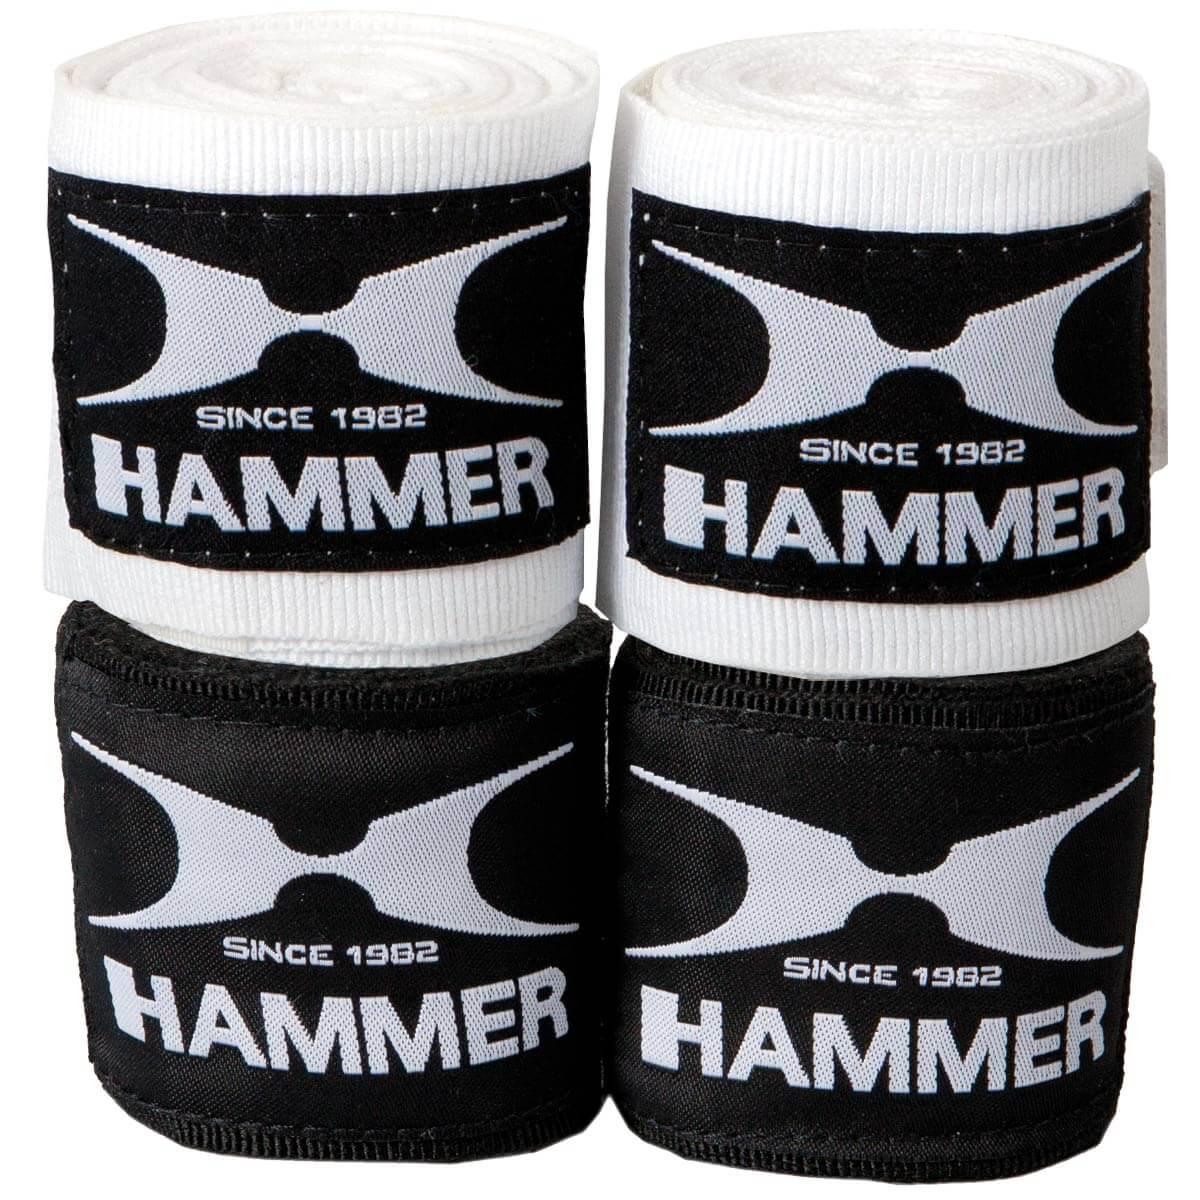 Image of HAMMER BOXING Boxzubehör Boxbandagen, elastisch, 4.5 m - schwarz